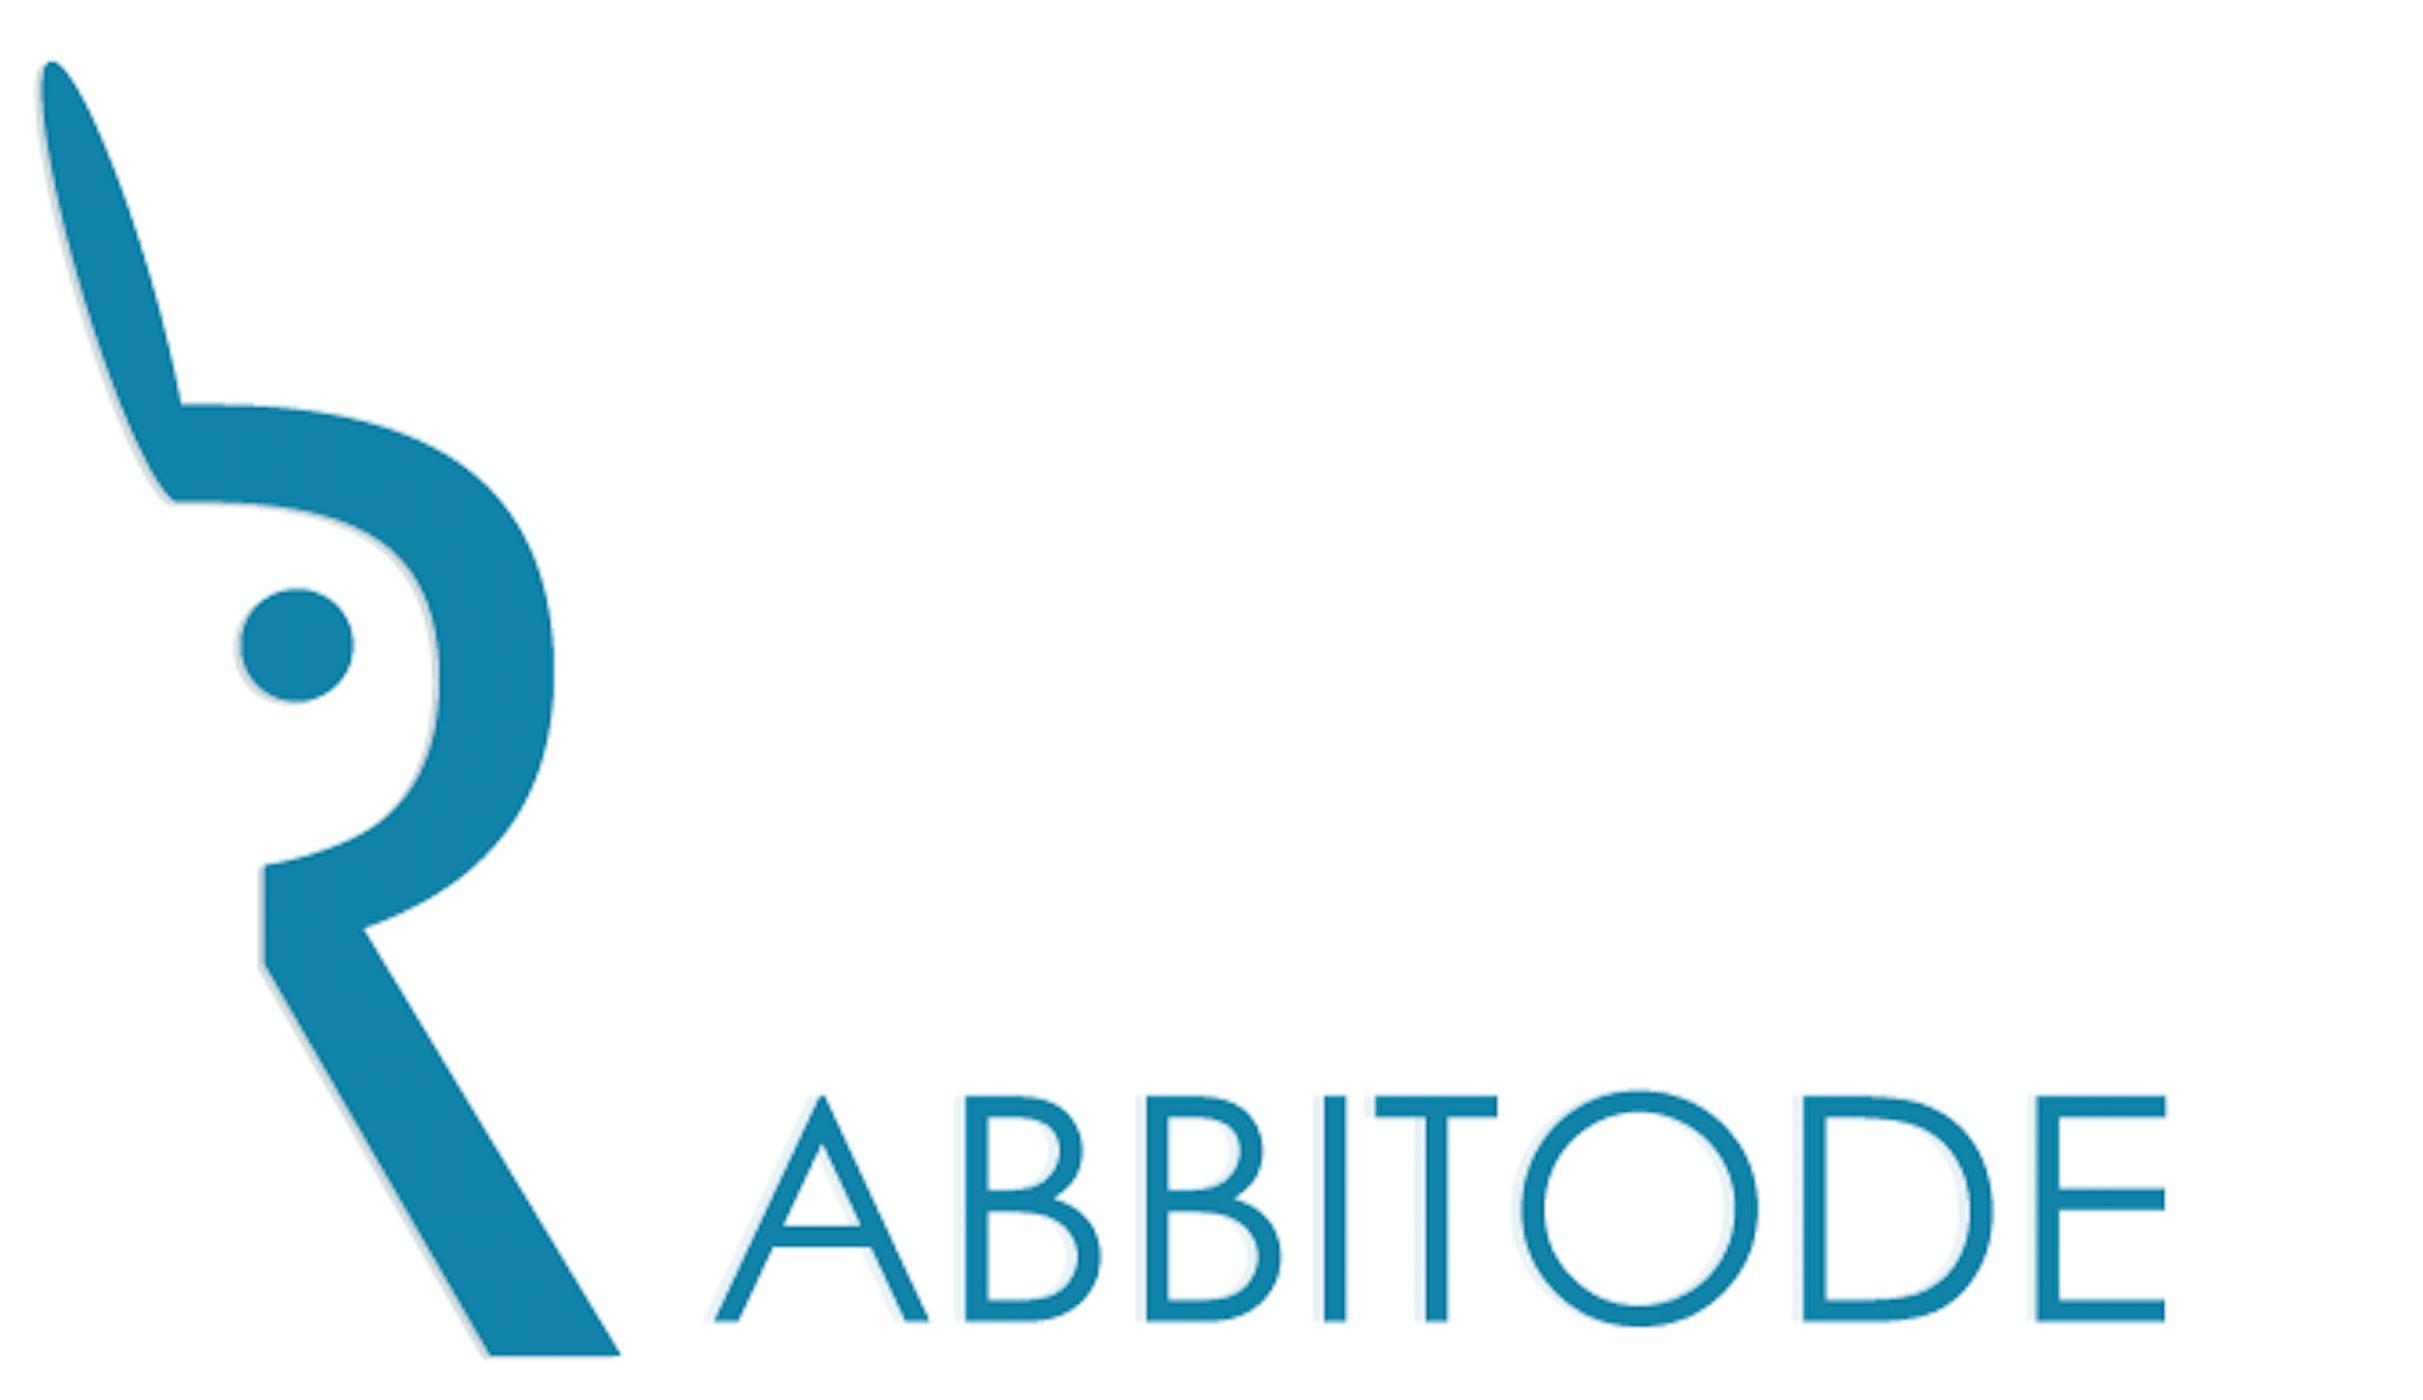 rabbitode logo